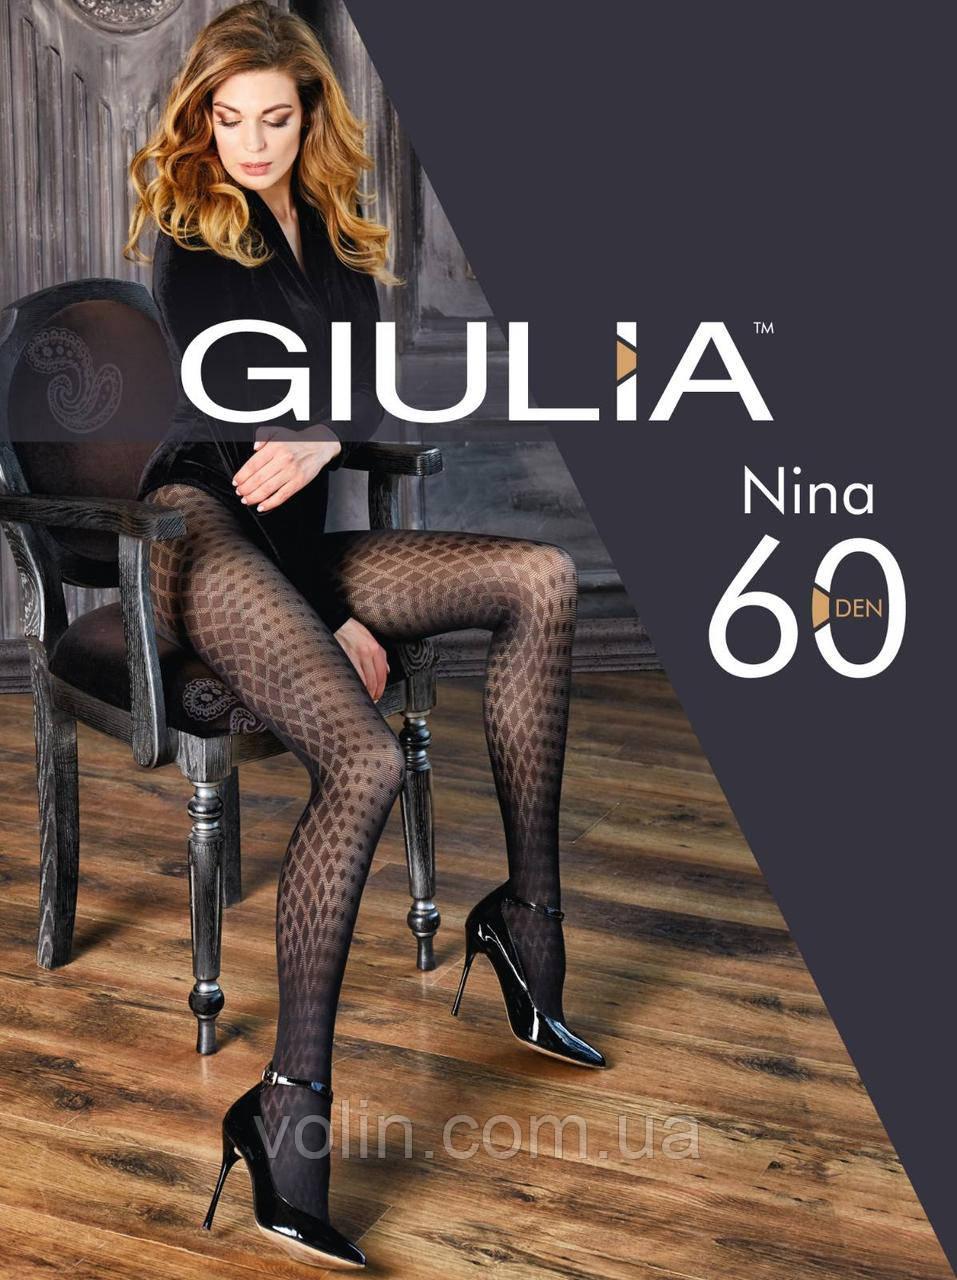 Колготки женские Giulia Nina 60 model 2